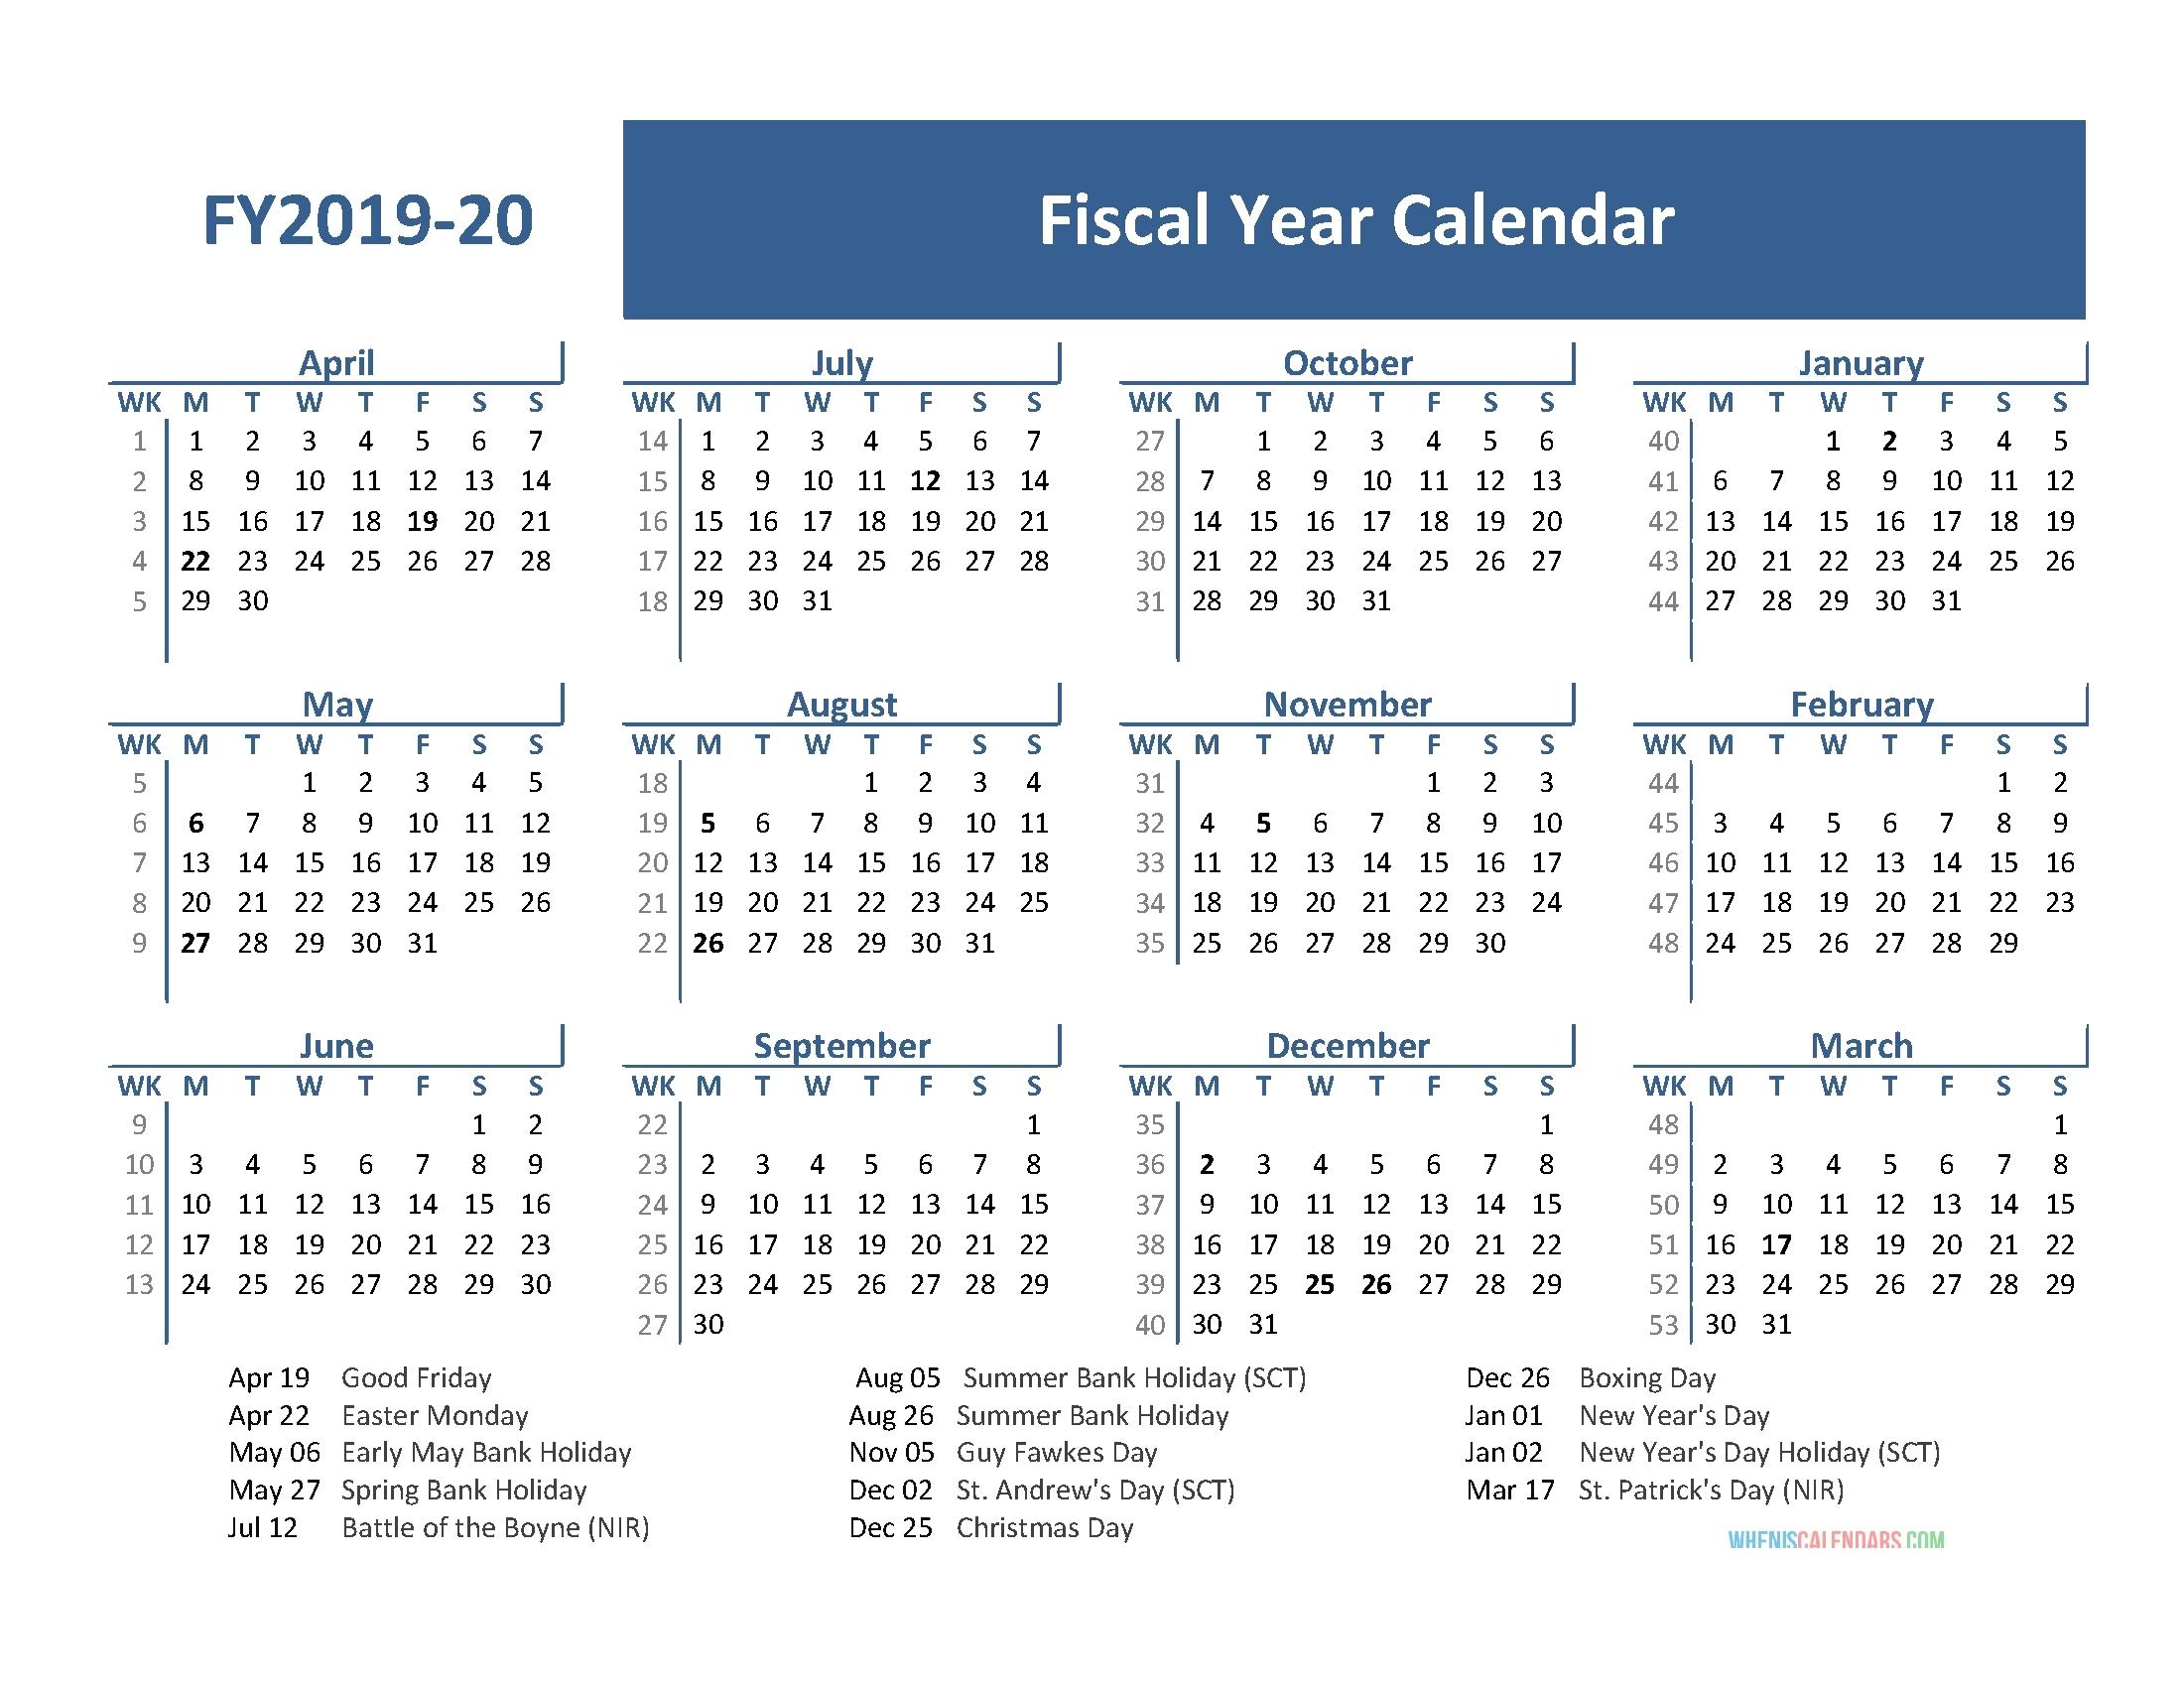 2019-2020 Calendar Financial Week Numbers - Calendar regarding 2019 2020 Financial Year Calendar